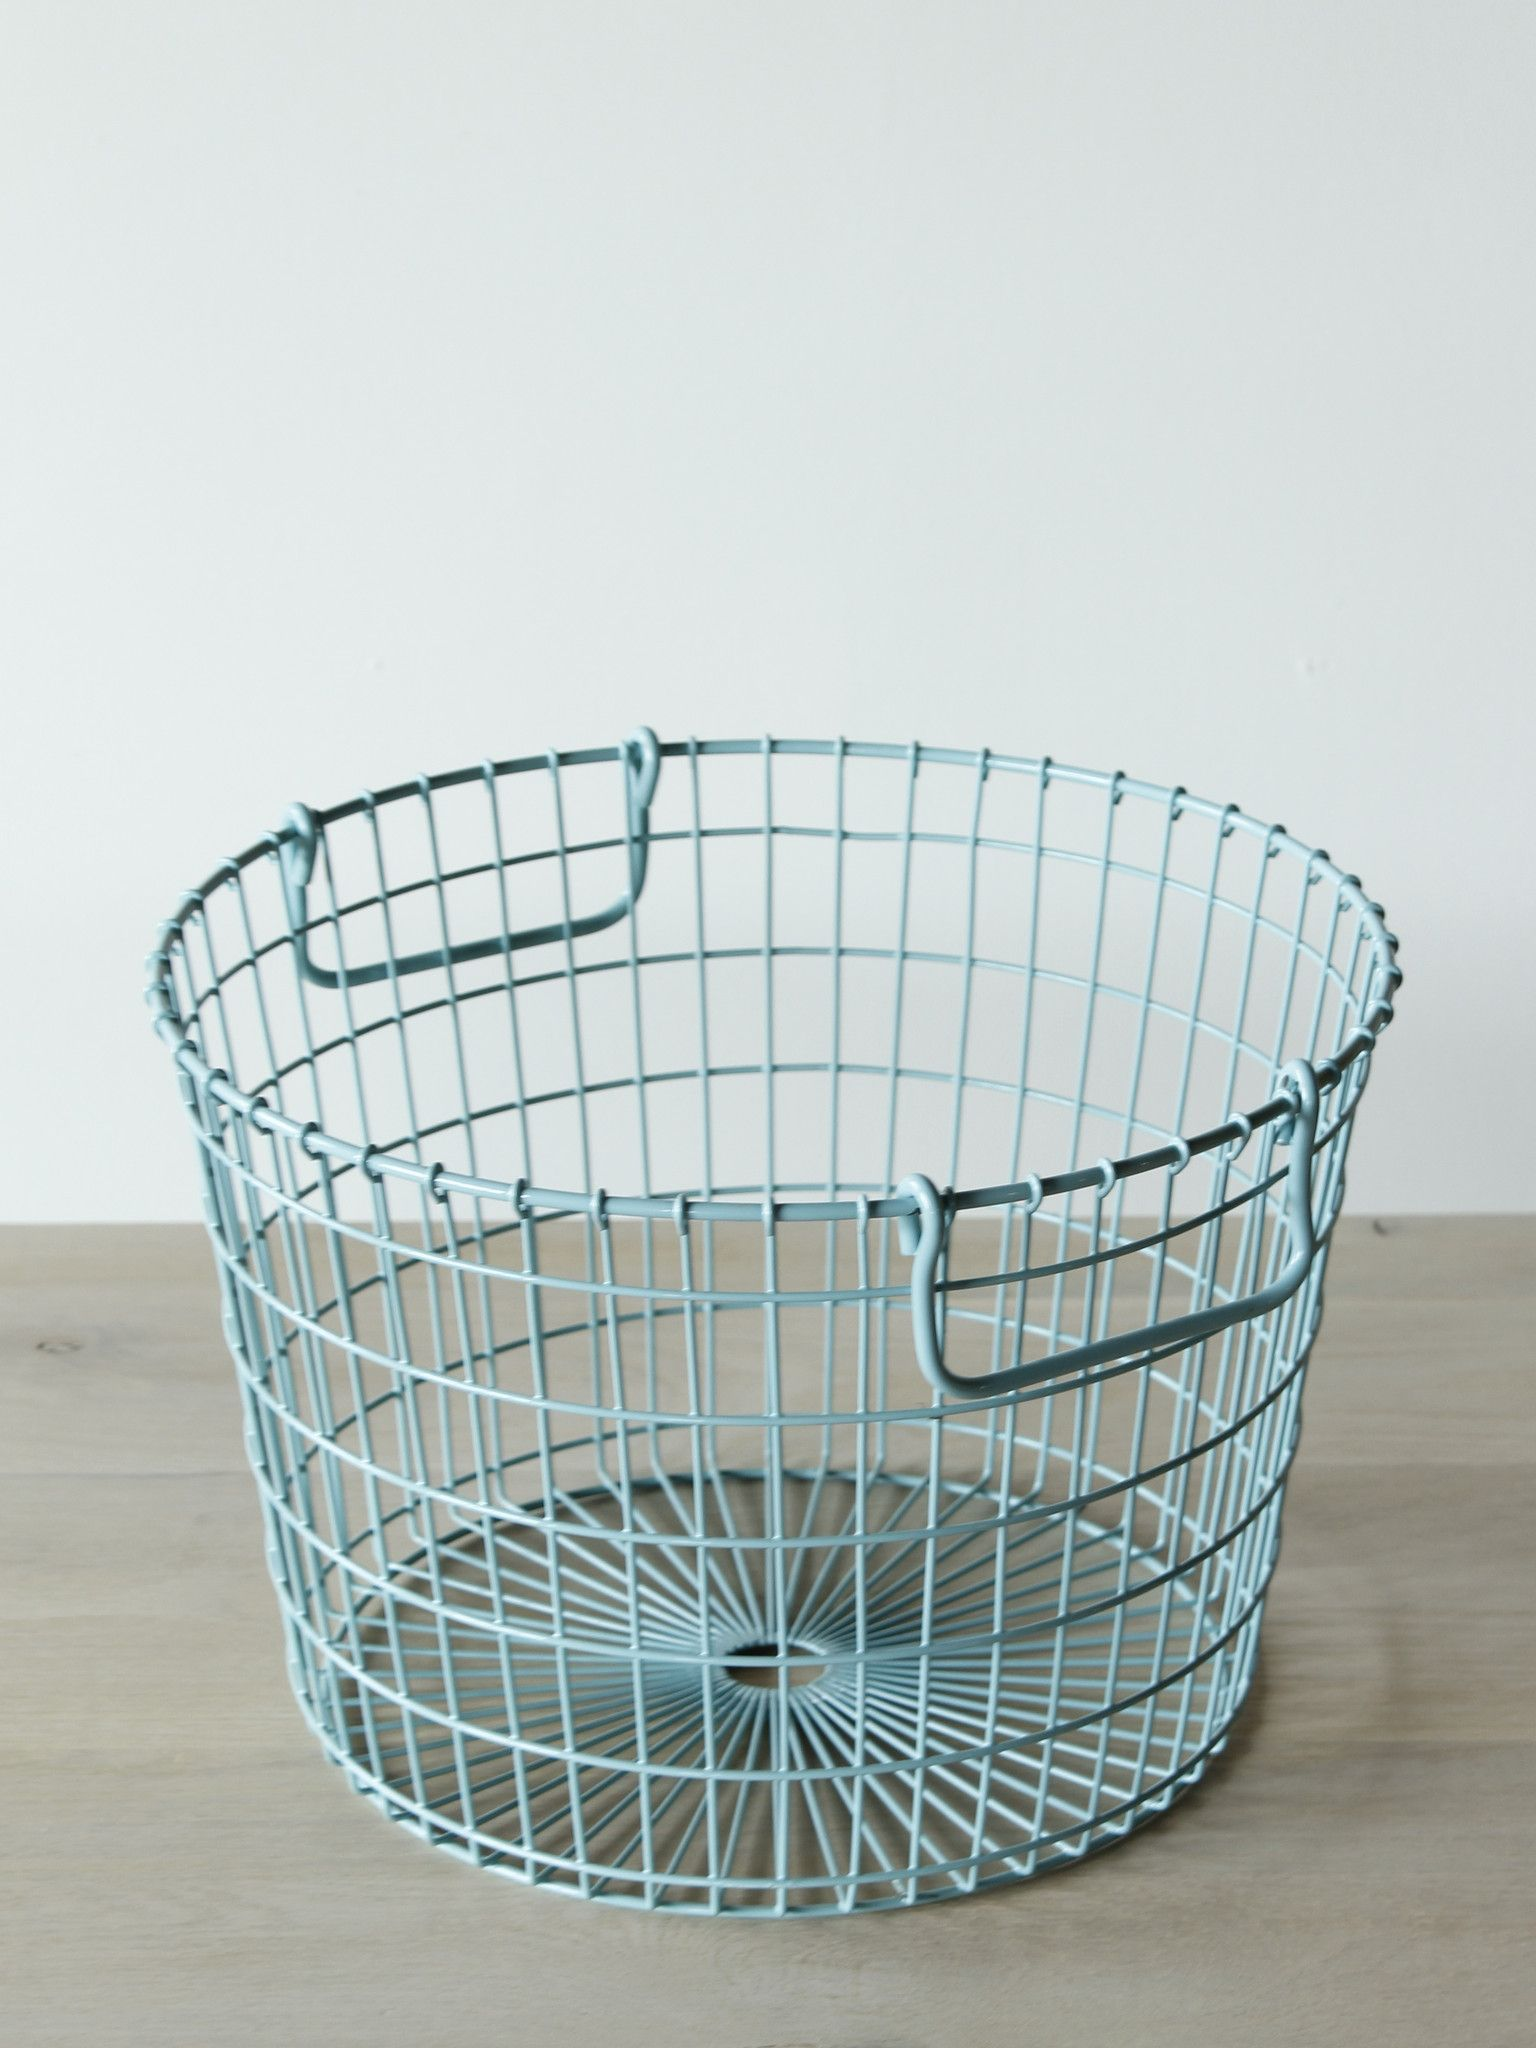 Wire Potato Basket -Blue | Lights, Wire basket and Mason jar kitchen